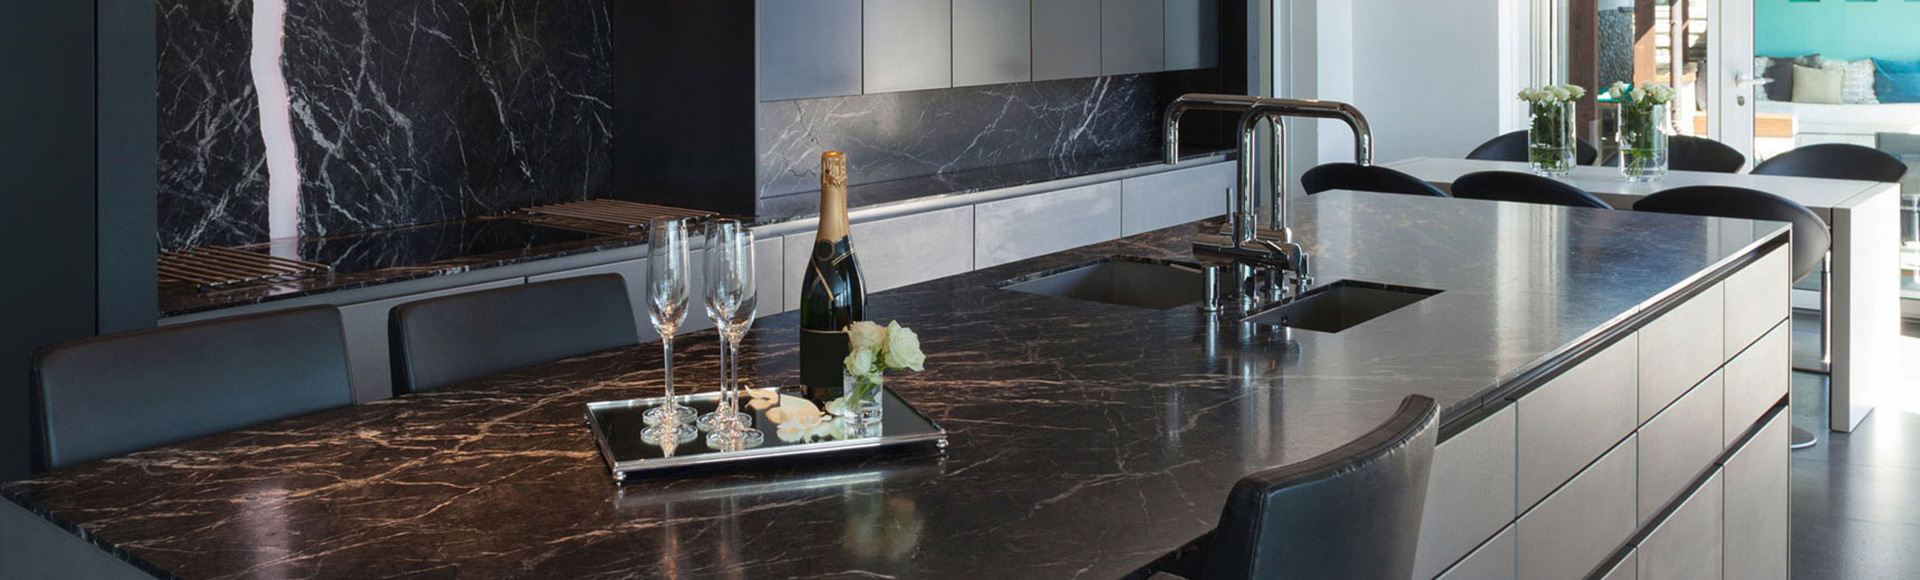 Klassische Marmor Küchenarbeitsplatten